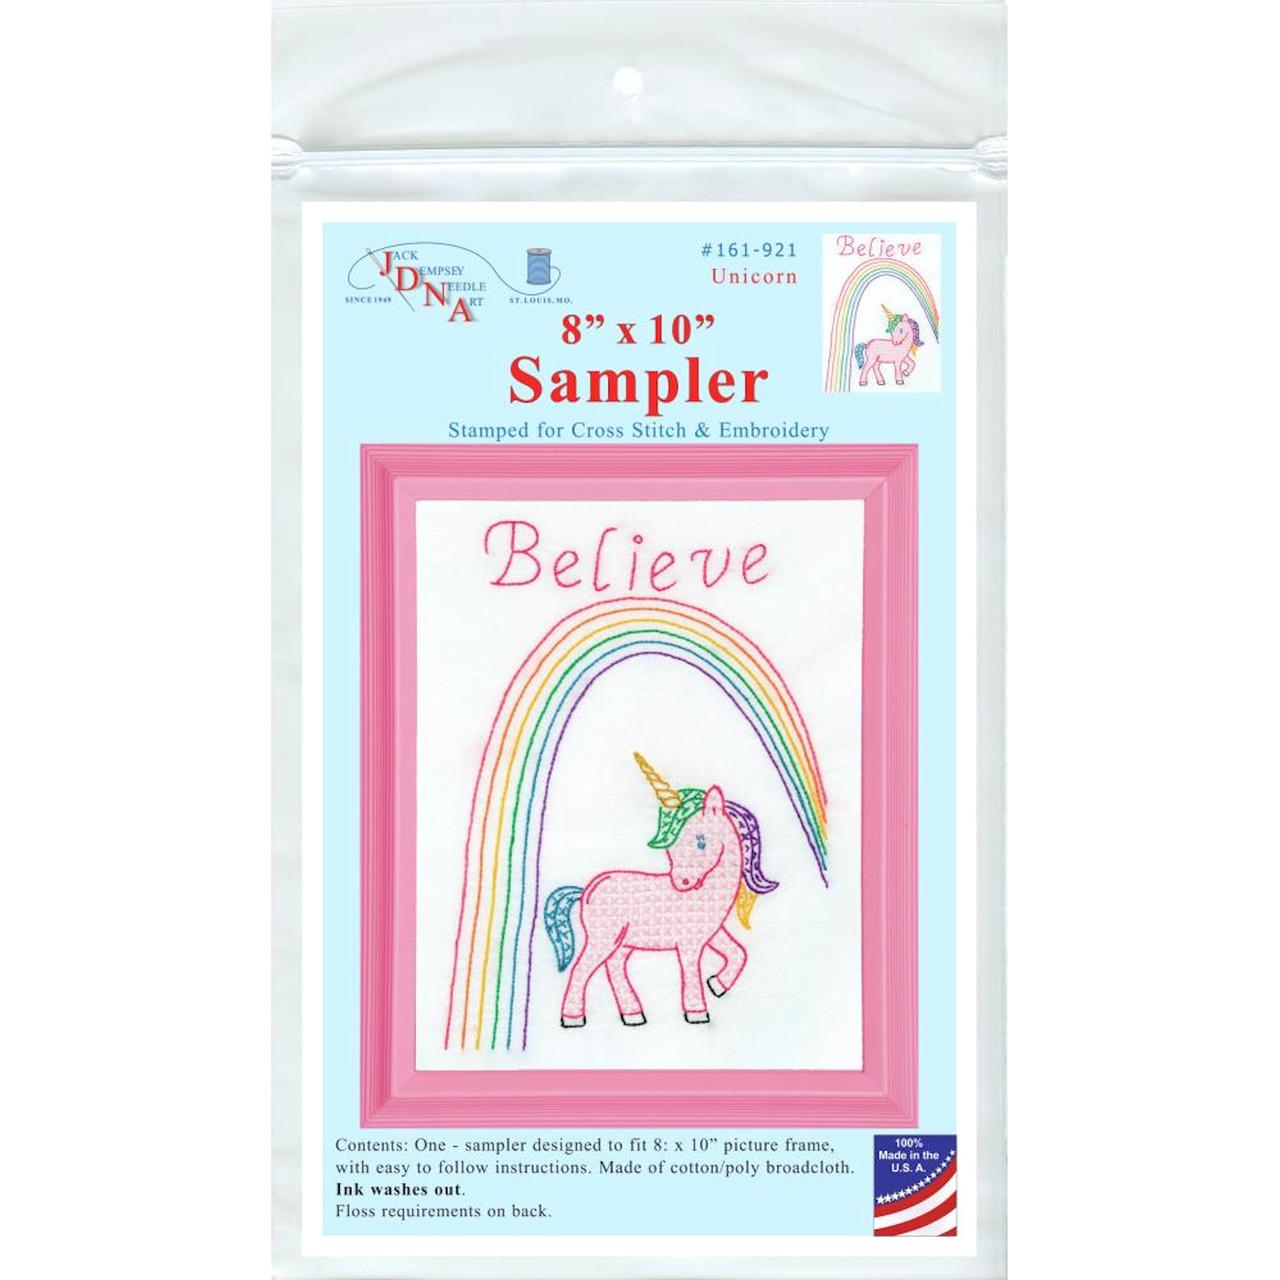 Jack Dempsey Needle Art - Believe Sampler